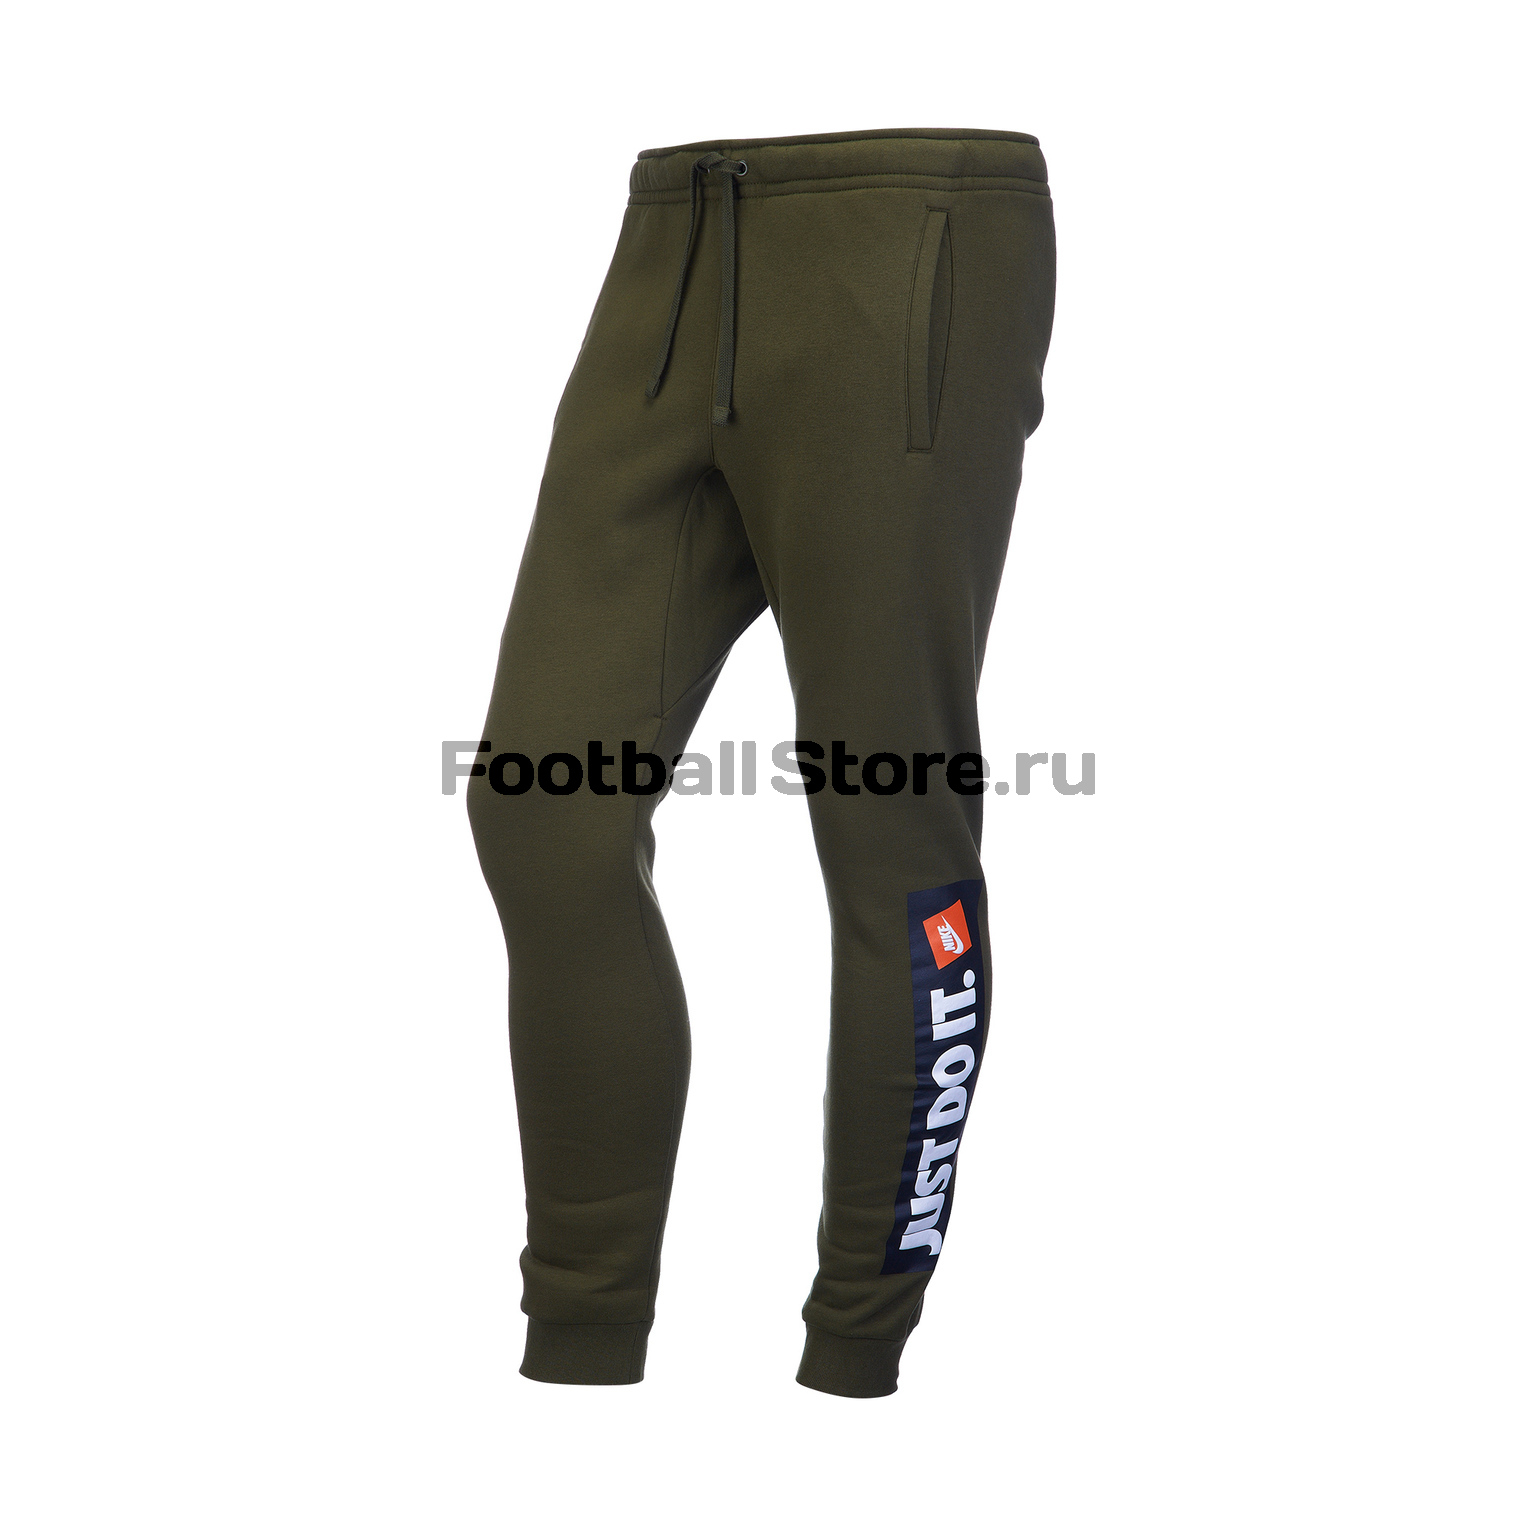 Брюки тренировочные Nike Just Do It NSW FLC 928725-395 брюки тренировочные nike m nsw jogger club flc 804408 063